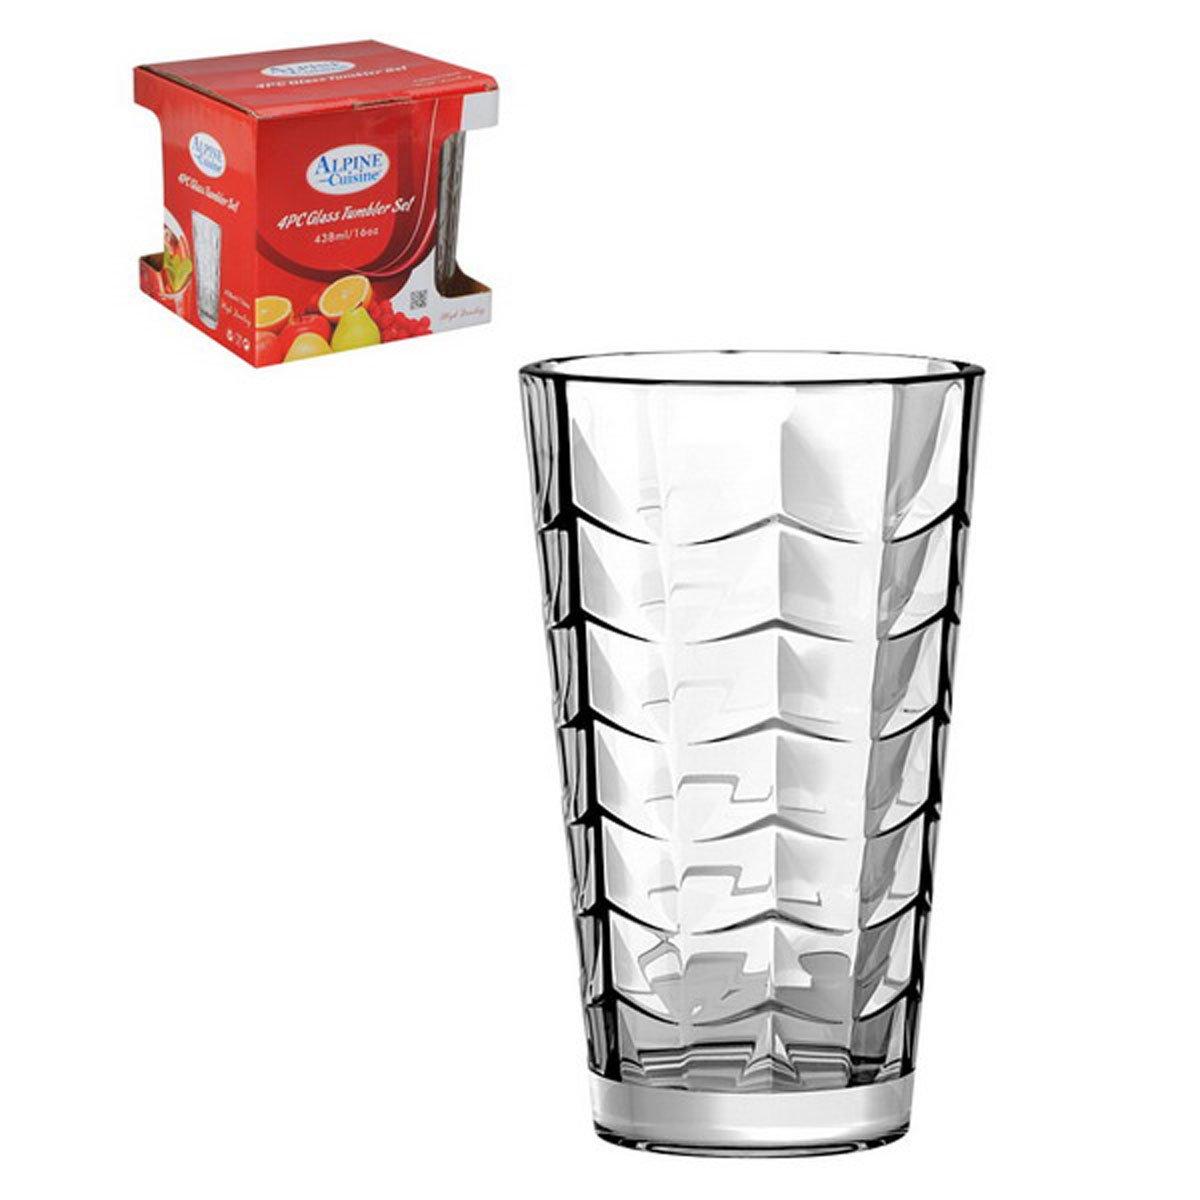 Set de 4 vasos de vidrio transparente sears com mx me entiende - Vidrio plastico transparente precio ...